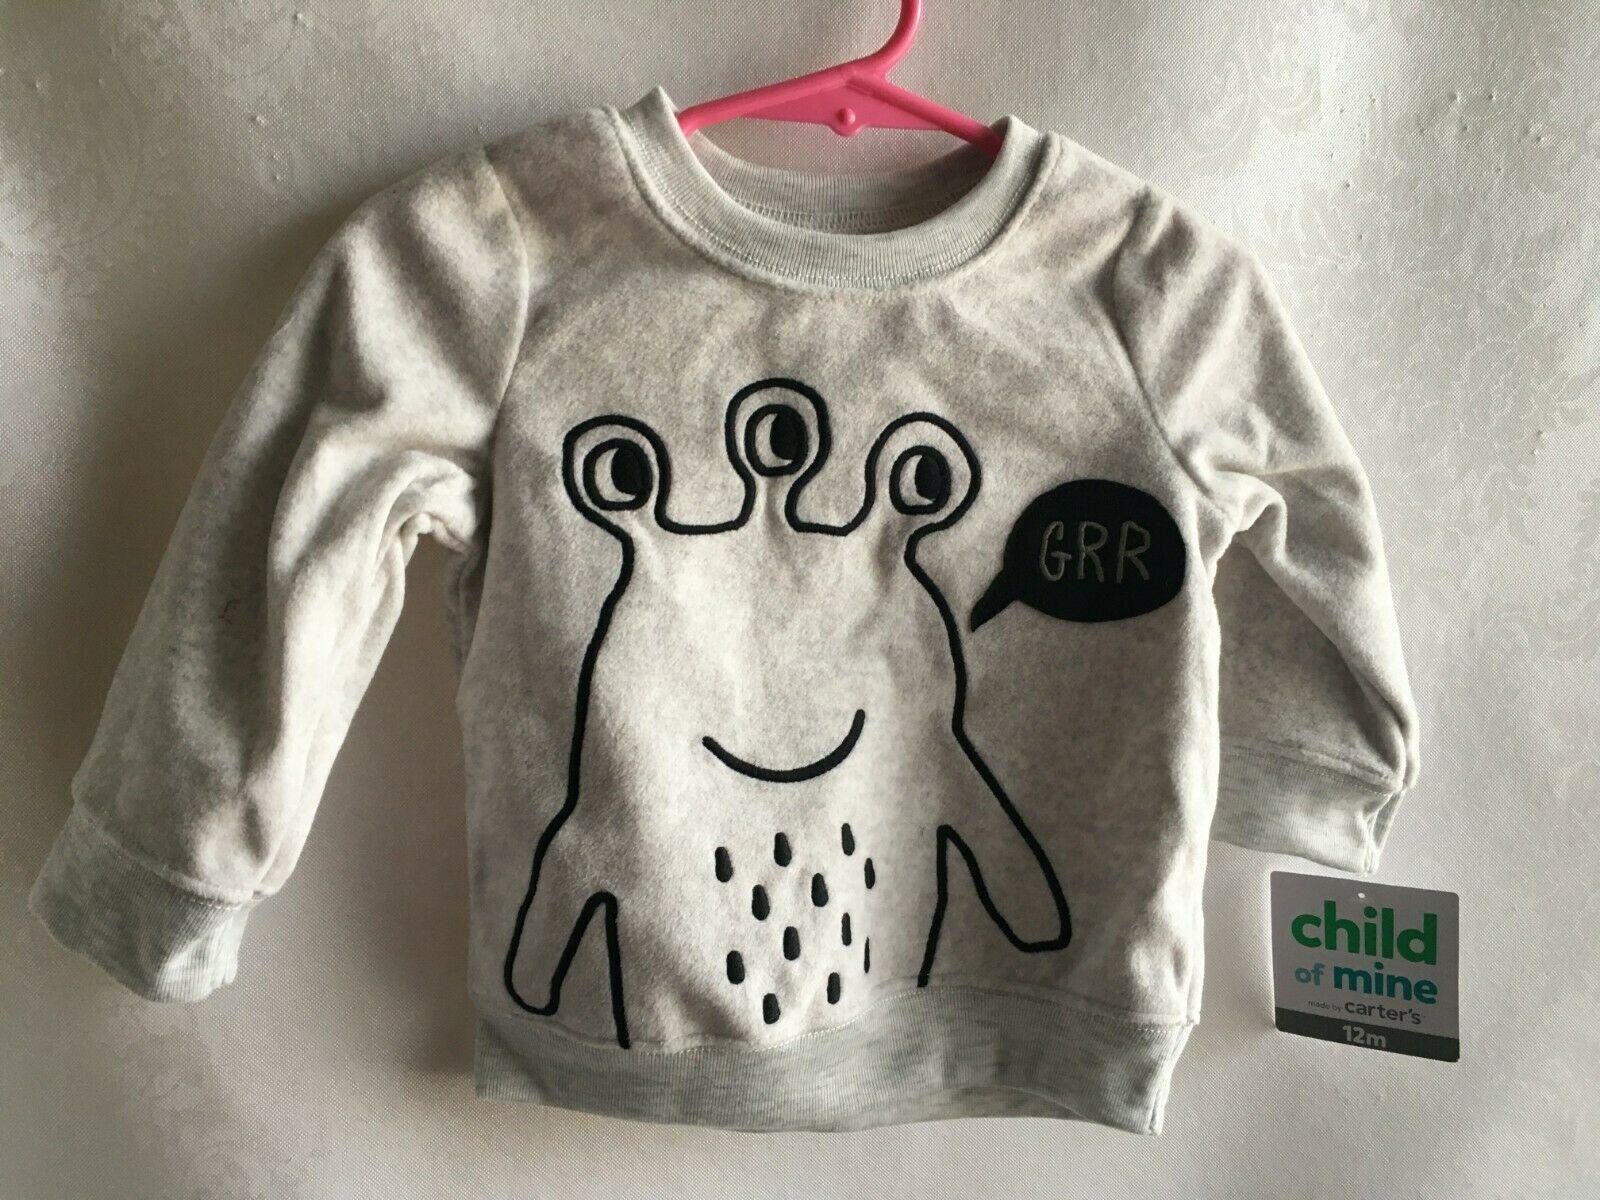 Infant Baby Boy/Girl Top 12 Months Animal Gray Black Soft Fuzzy Warm New w/Tags - $8.66